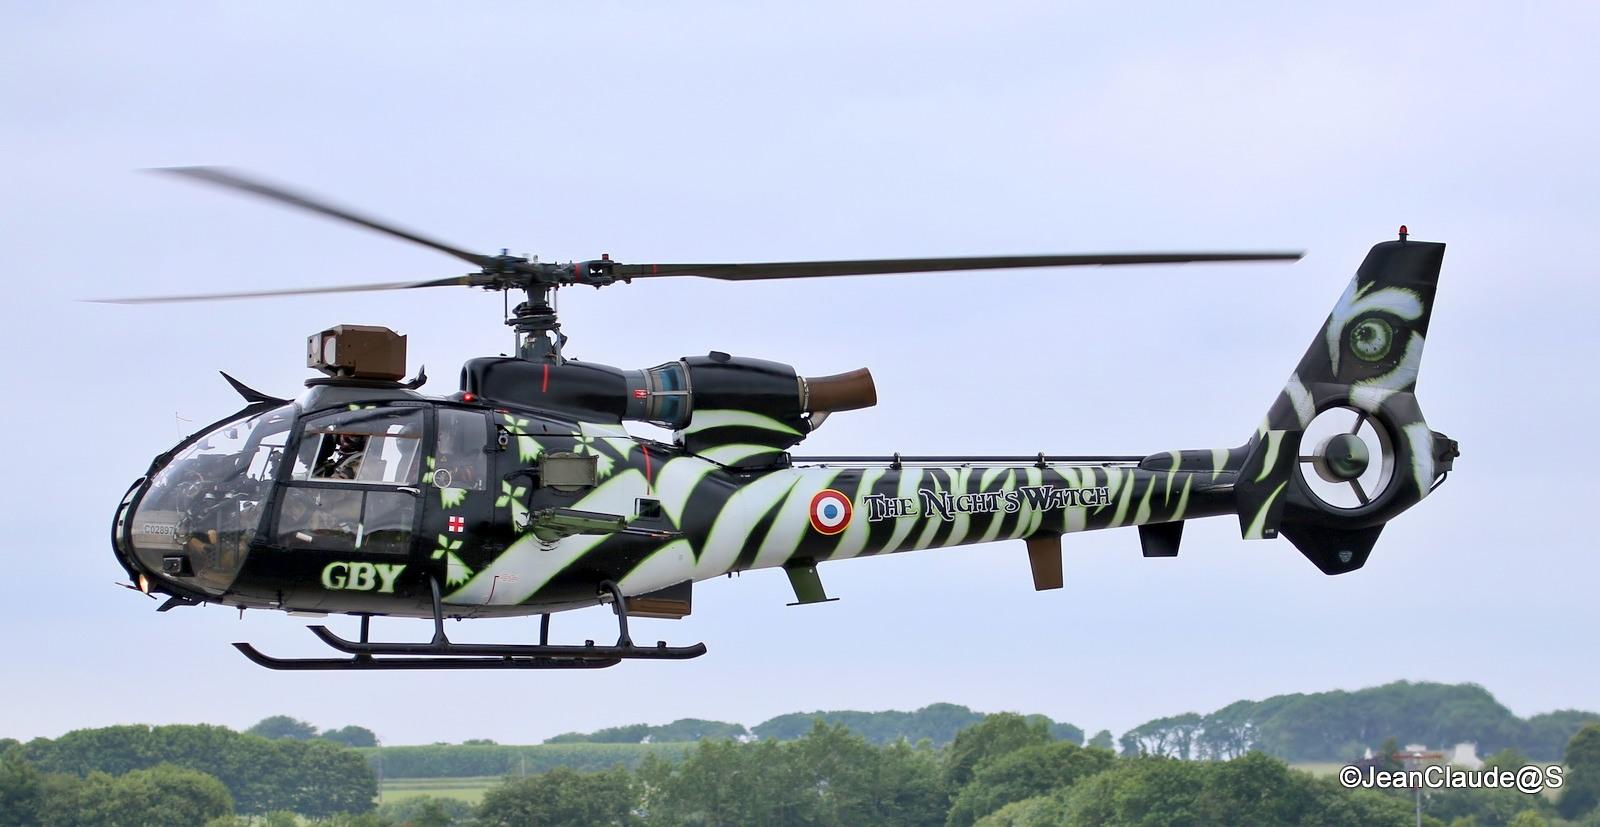 NATO Tiger Meet 2017 Landivisiau Img_1483_filtered-526f8bb